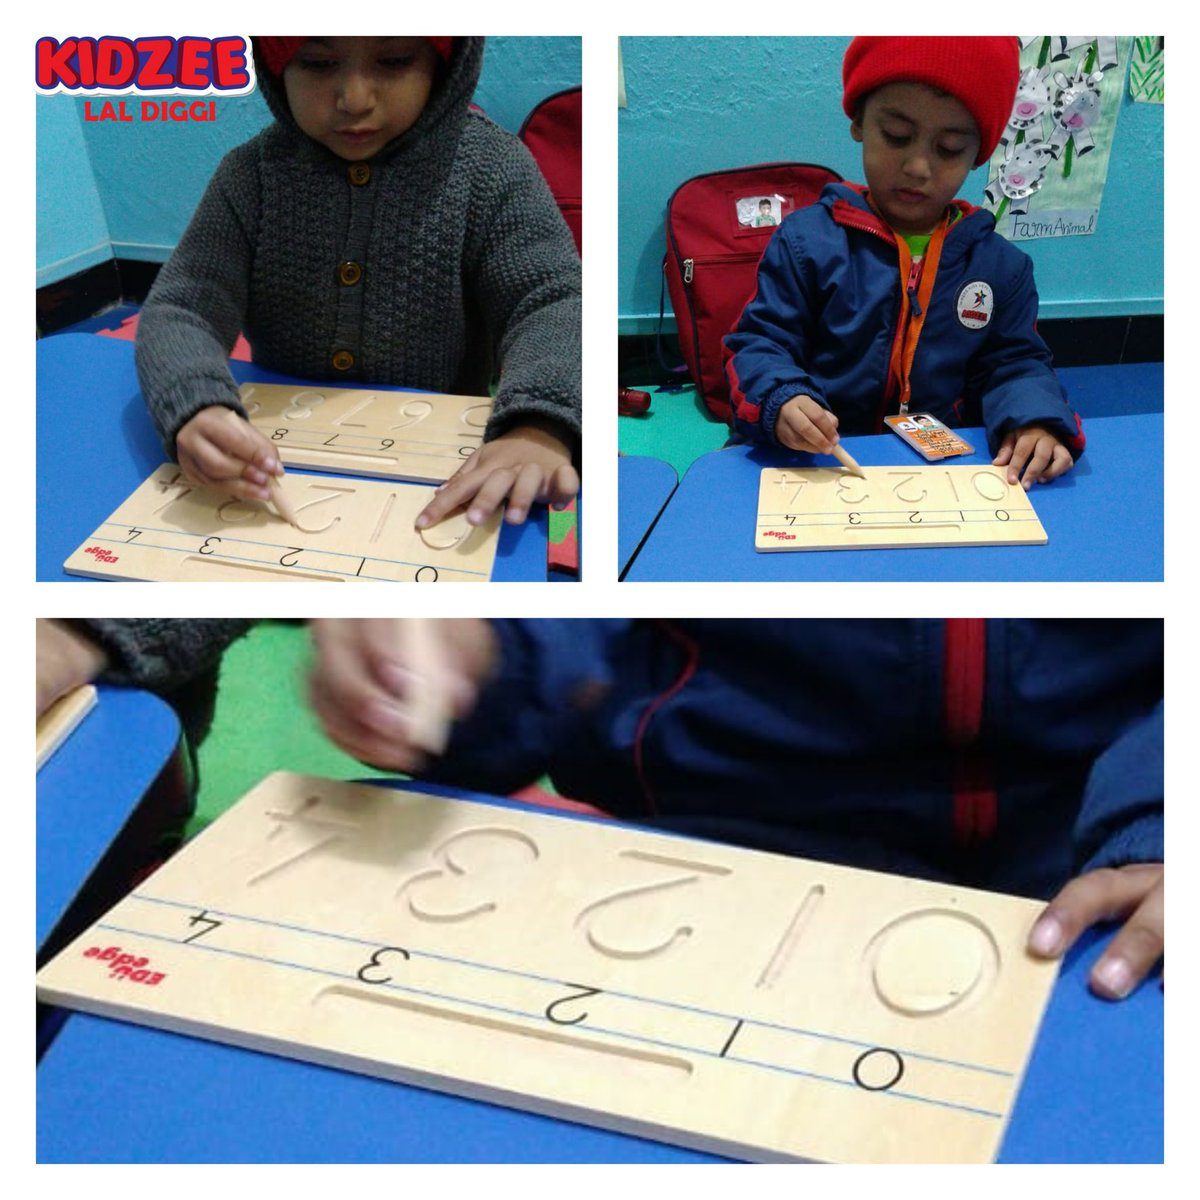 Trace the pattern-math time #KIDZEE #LALDIGGI #preschool